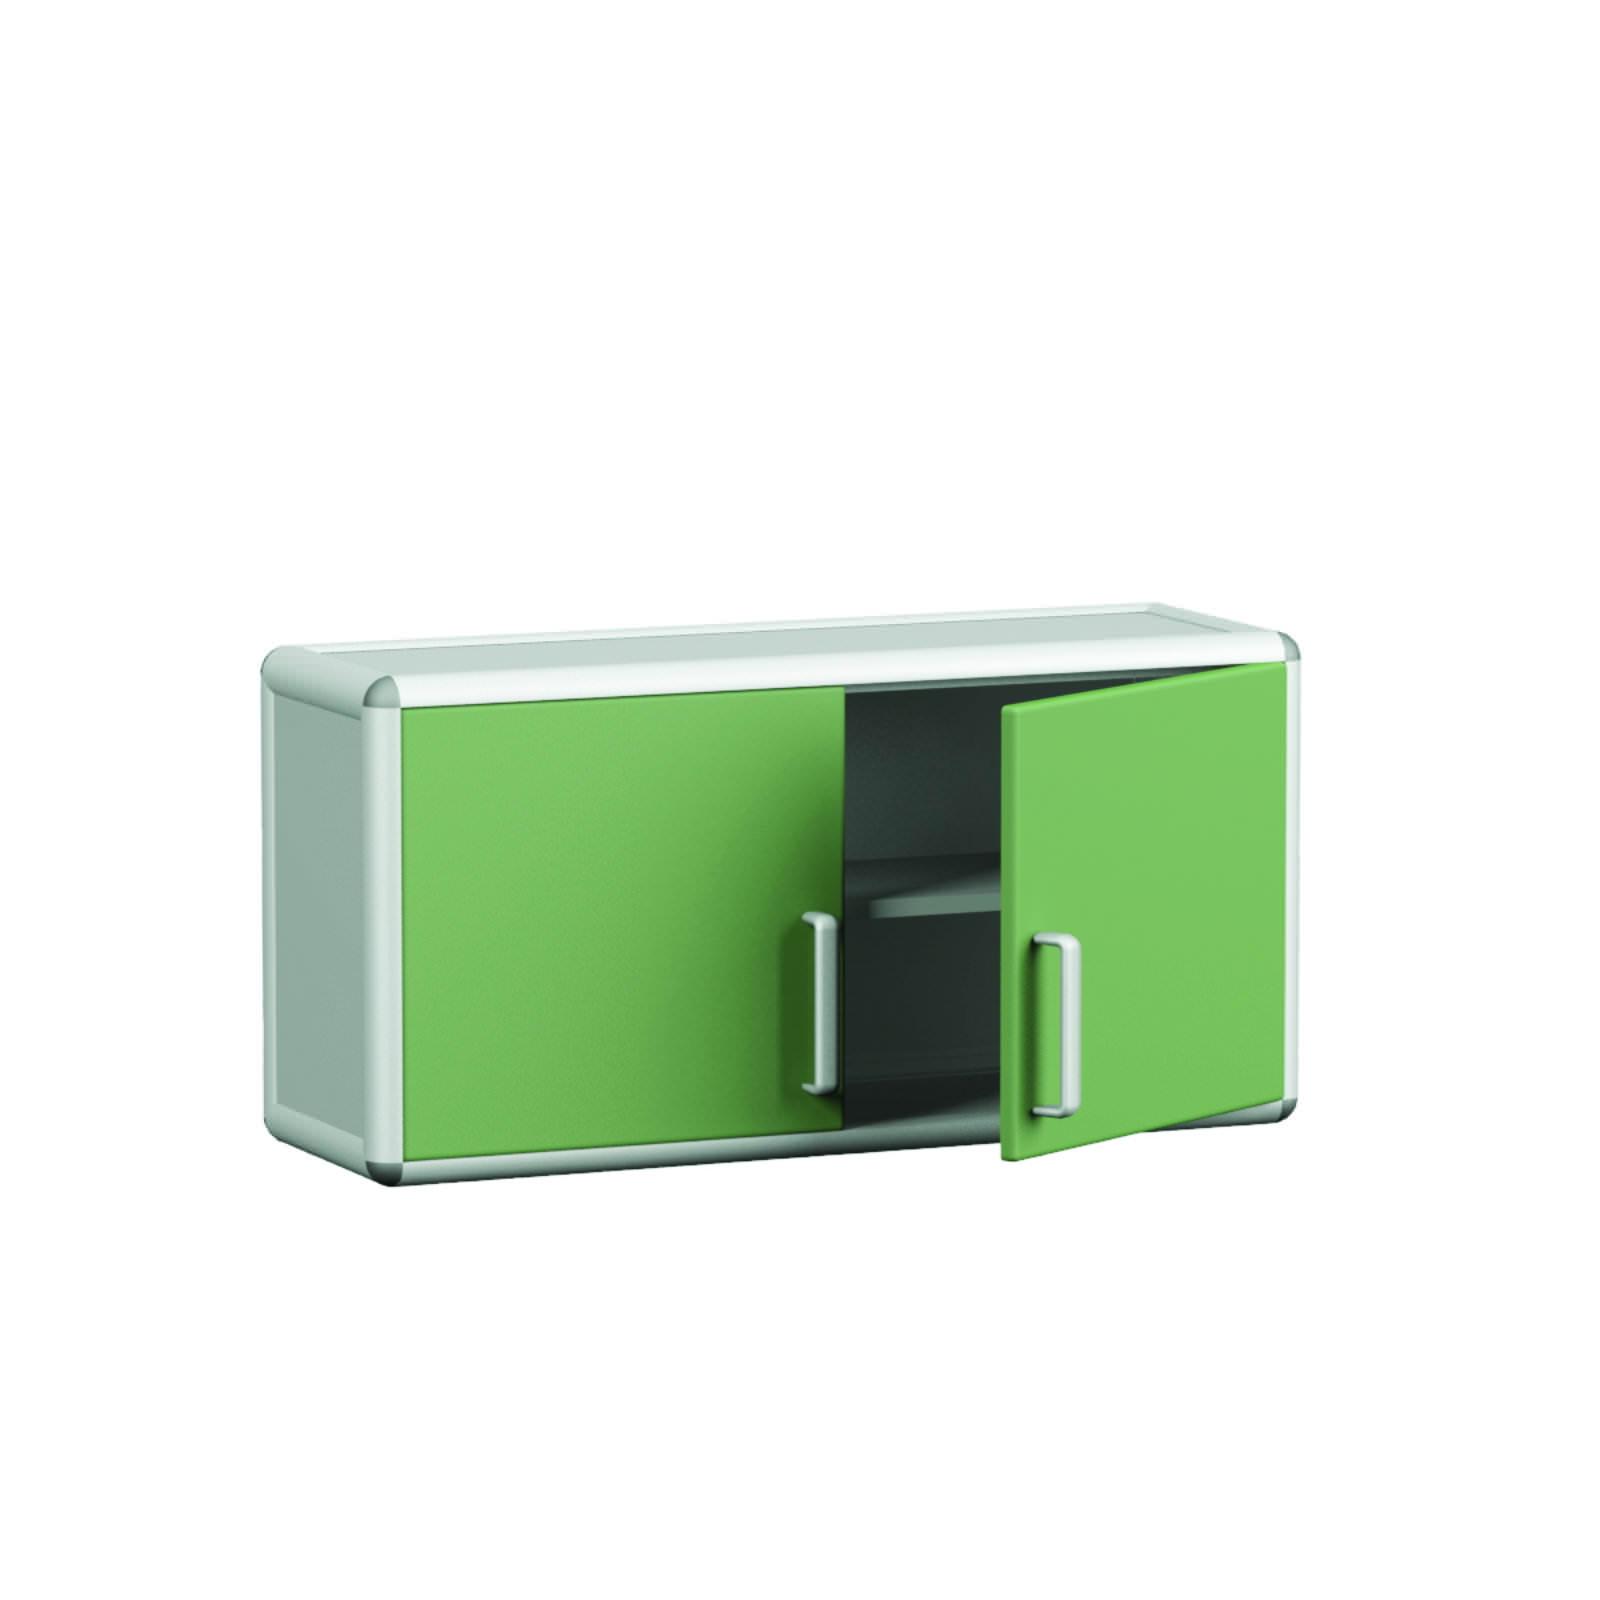 Шкаф навесной ДМ-1-002-02